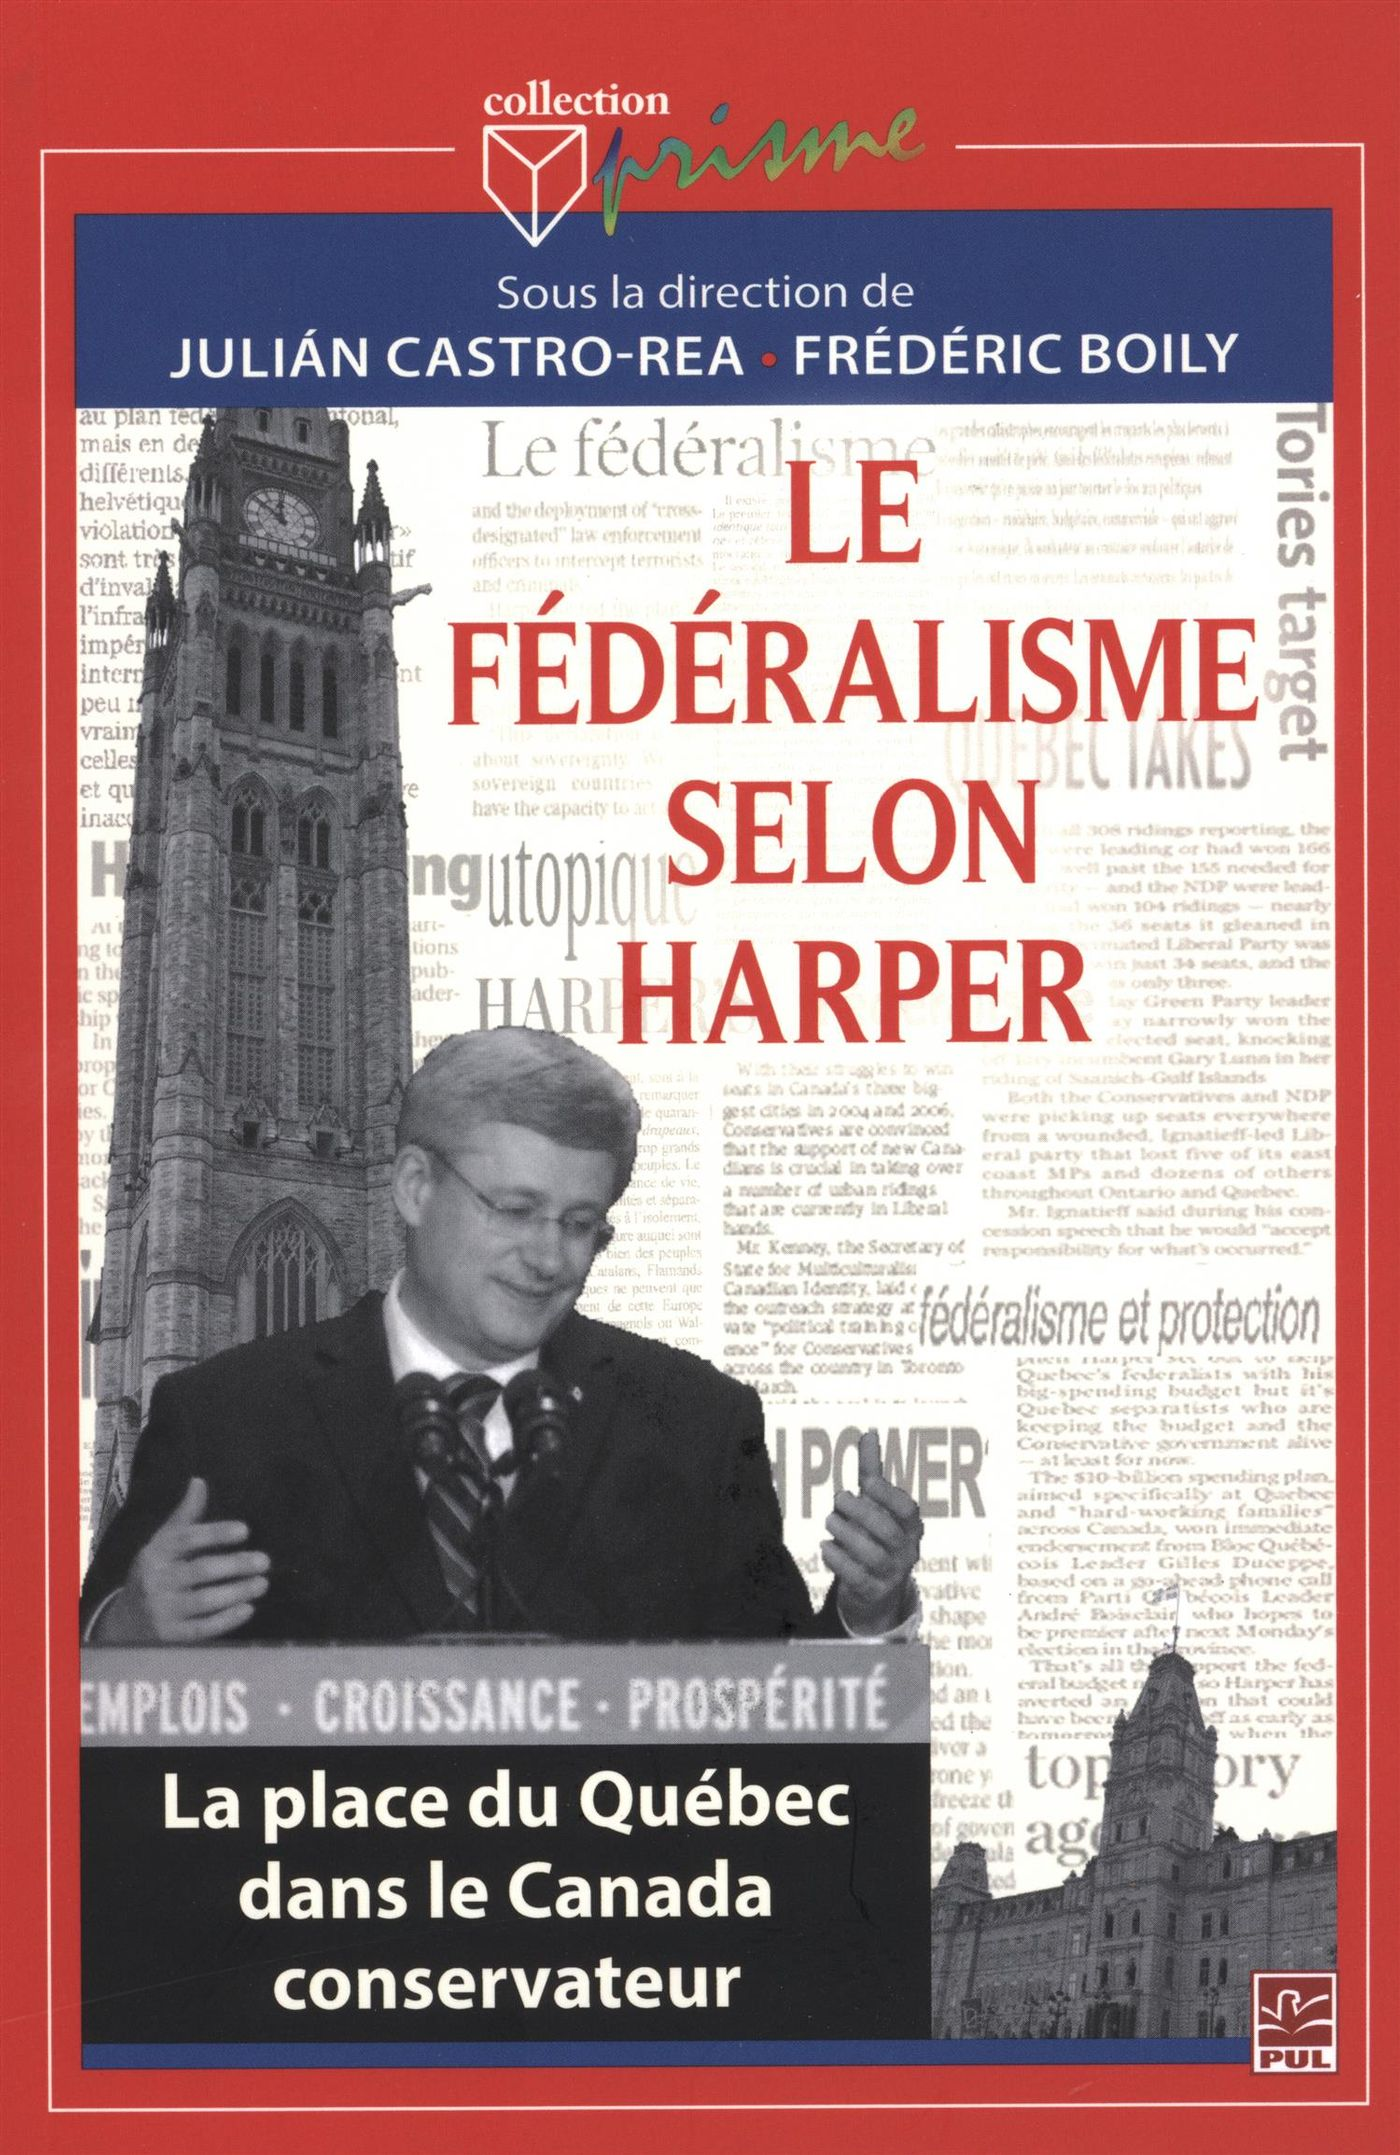 Le fédéralisme selon Harper